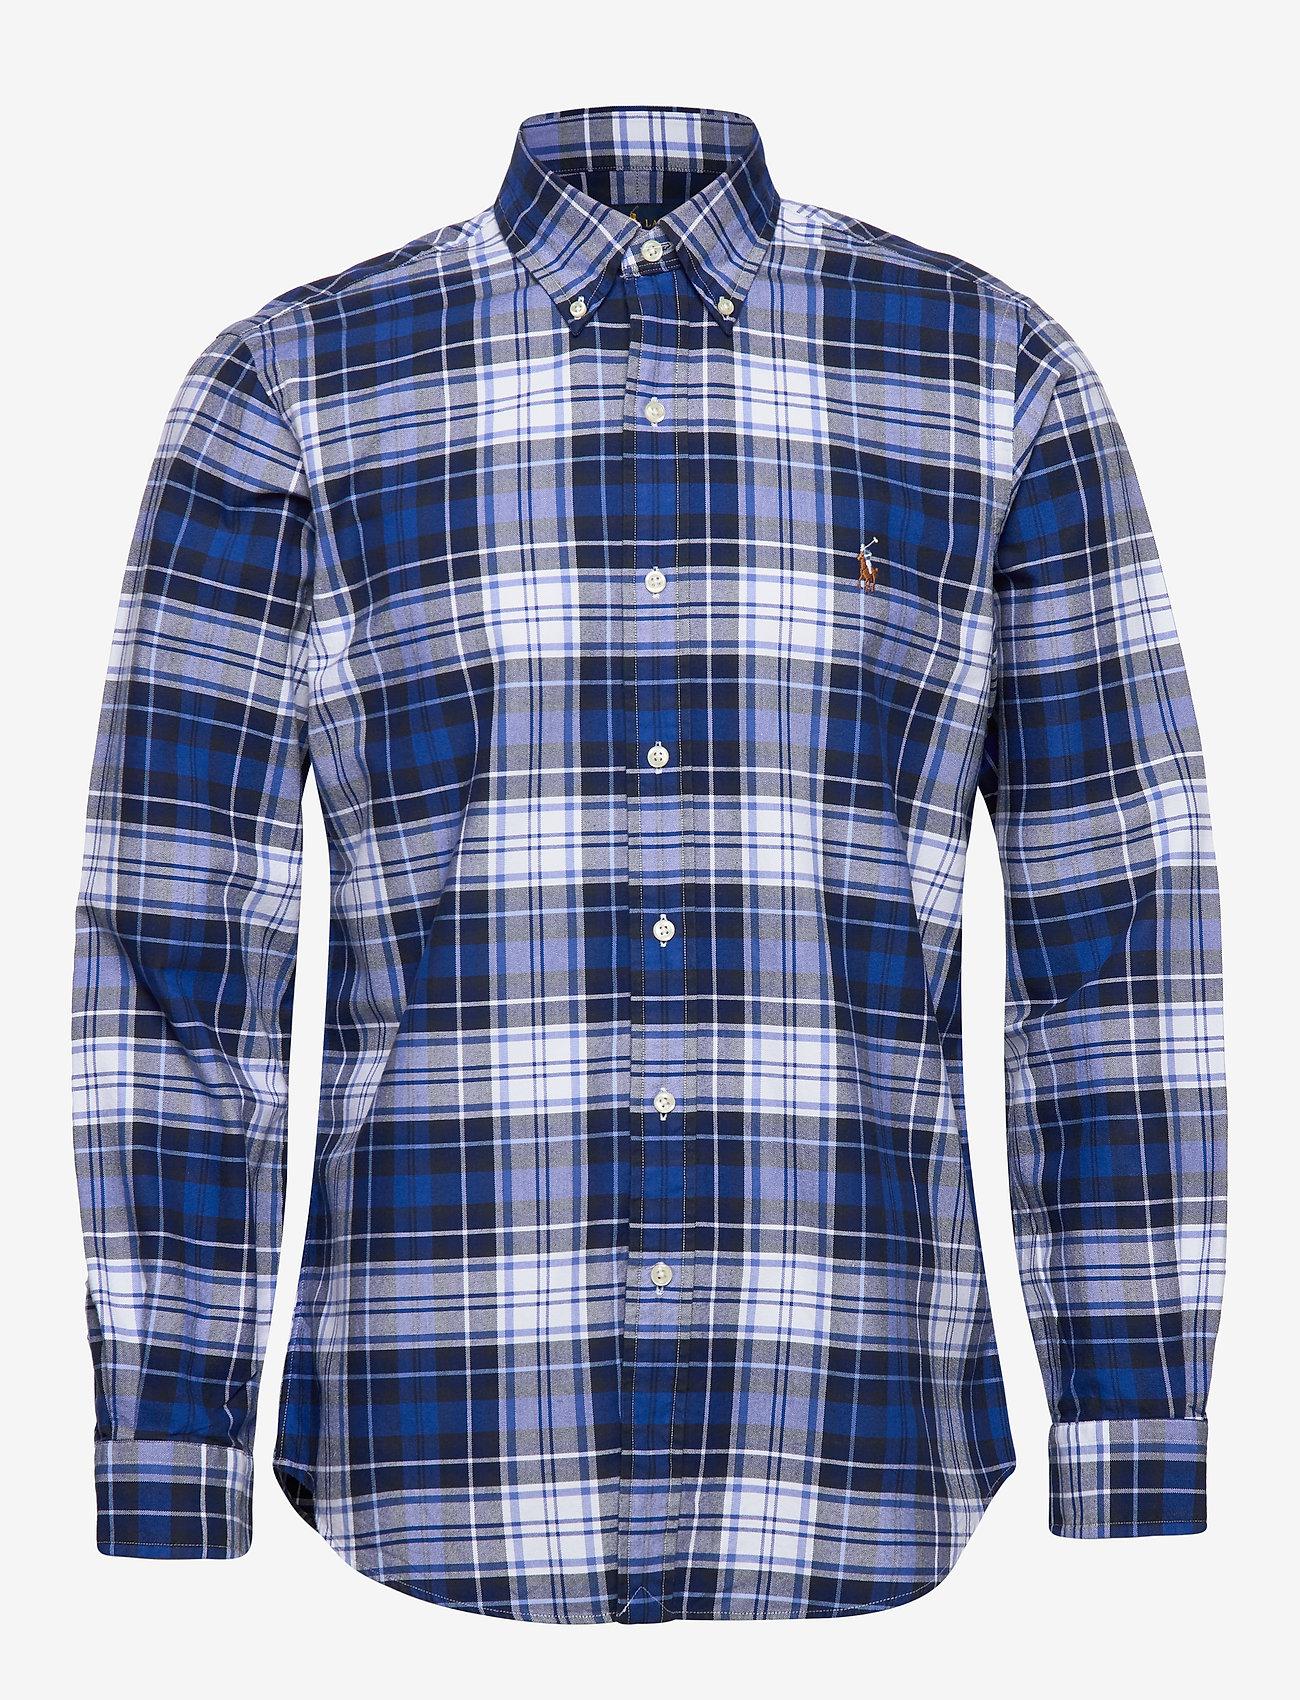 Polo Ralph Lauren - Custom Fit Striped Shirt - oxford shirts - 4336 blue/white m - 0